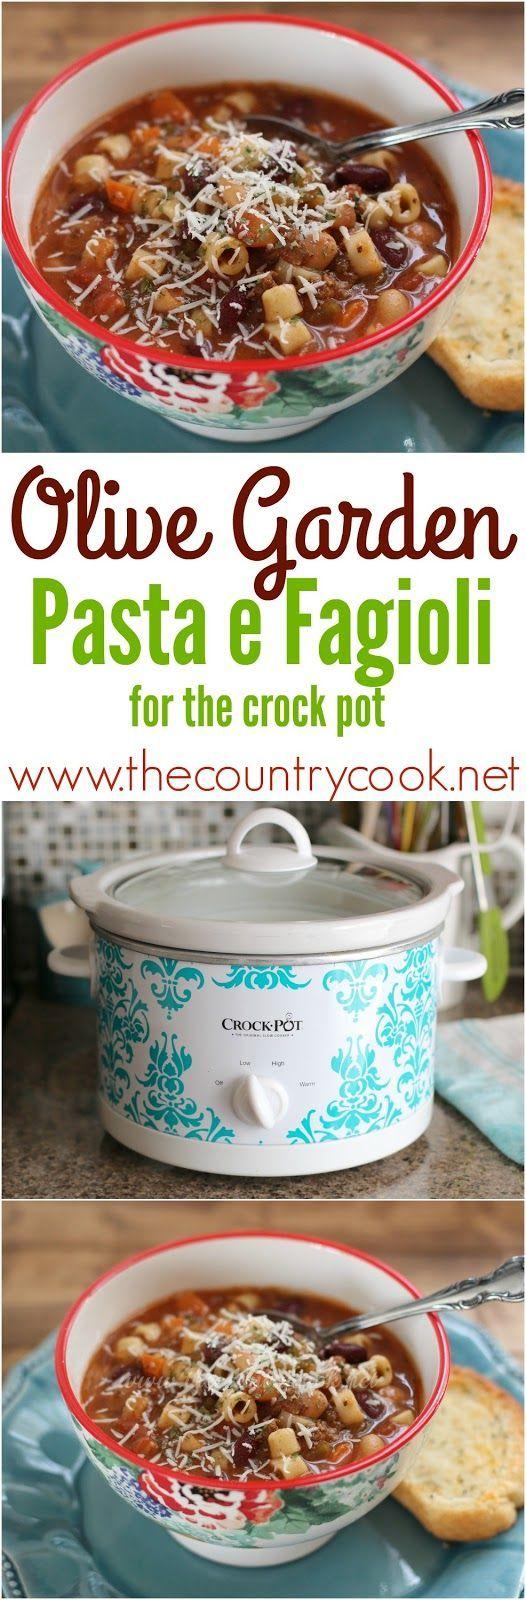 Crock Pot Olive Garden Pasta E Fagioli Soup Recipe Gardens Soups And Olives